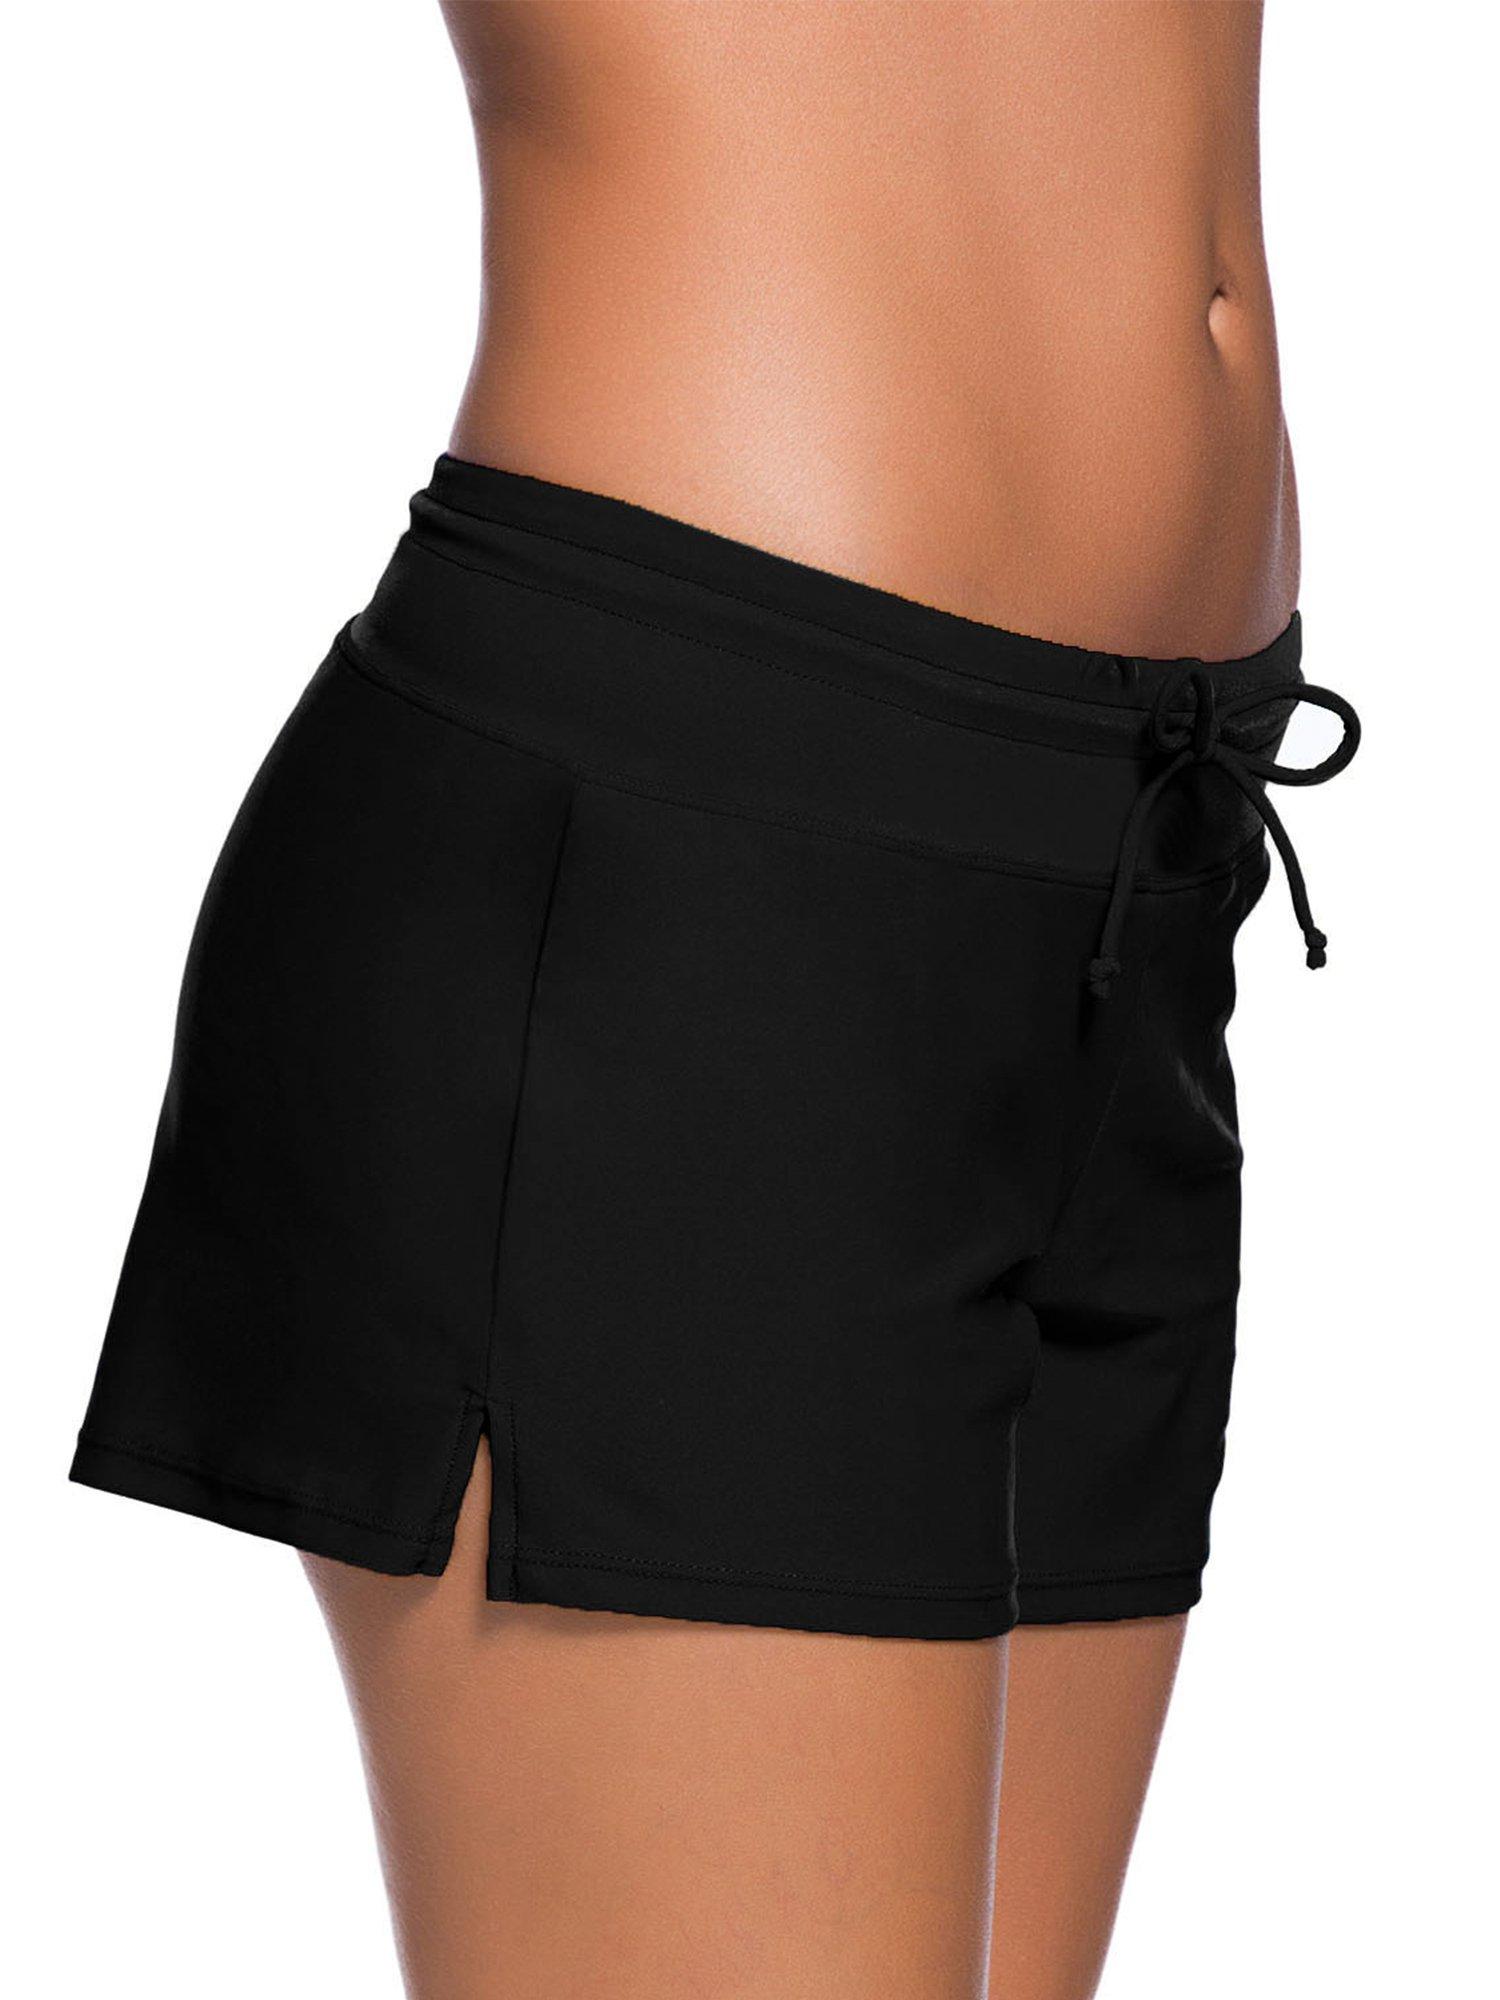 Satinior Women Swimsuit Shorts Tankini Swim Briefs Side Split Plus Size Bottom Boardshort Summer Beach Swimwear Trunks (L Size, Black) by Satinior (Image #3)